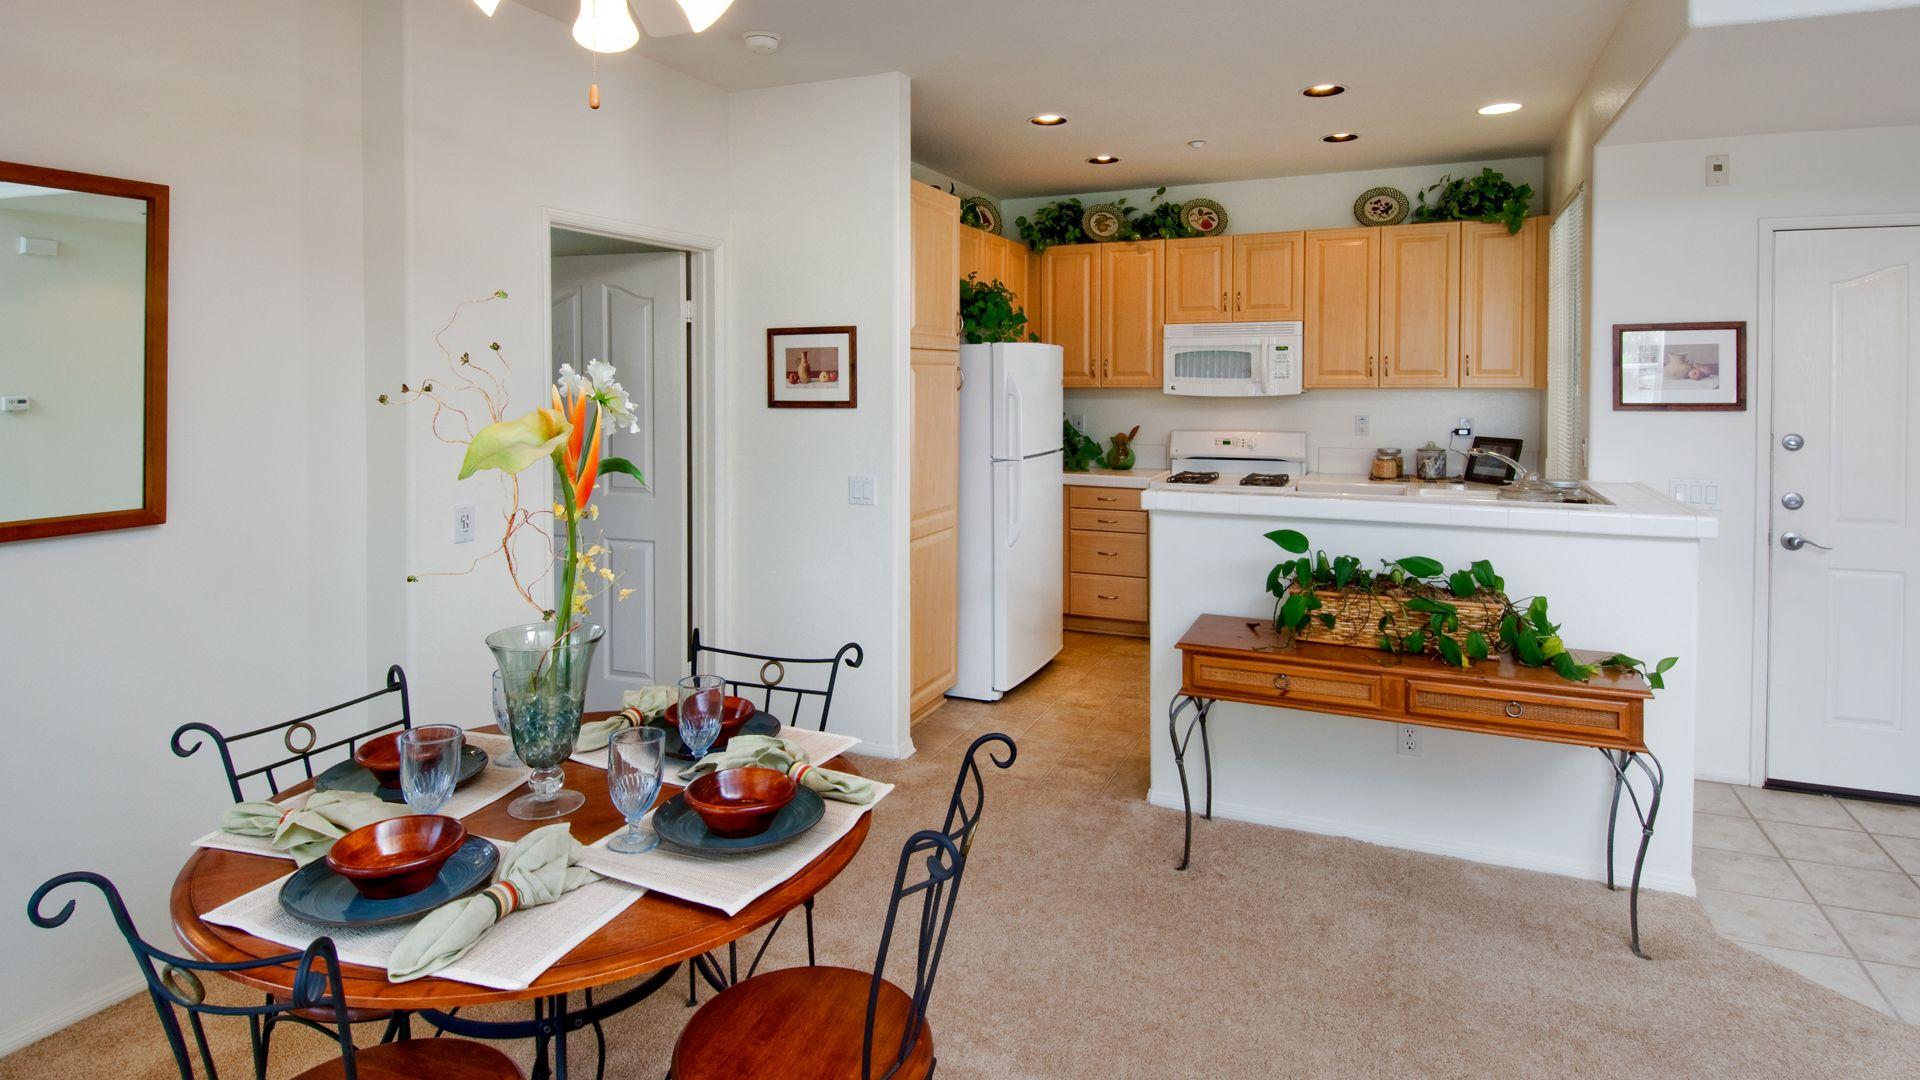 Via Ventura - Kitchen and Dining Room